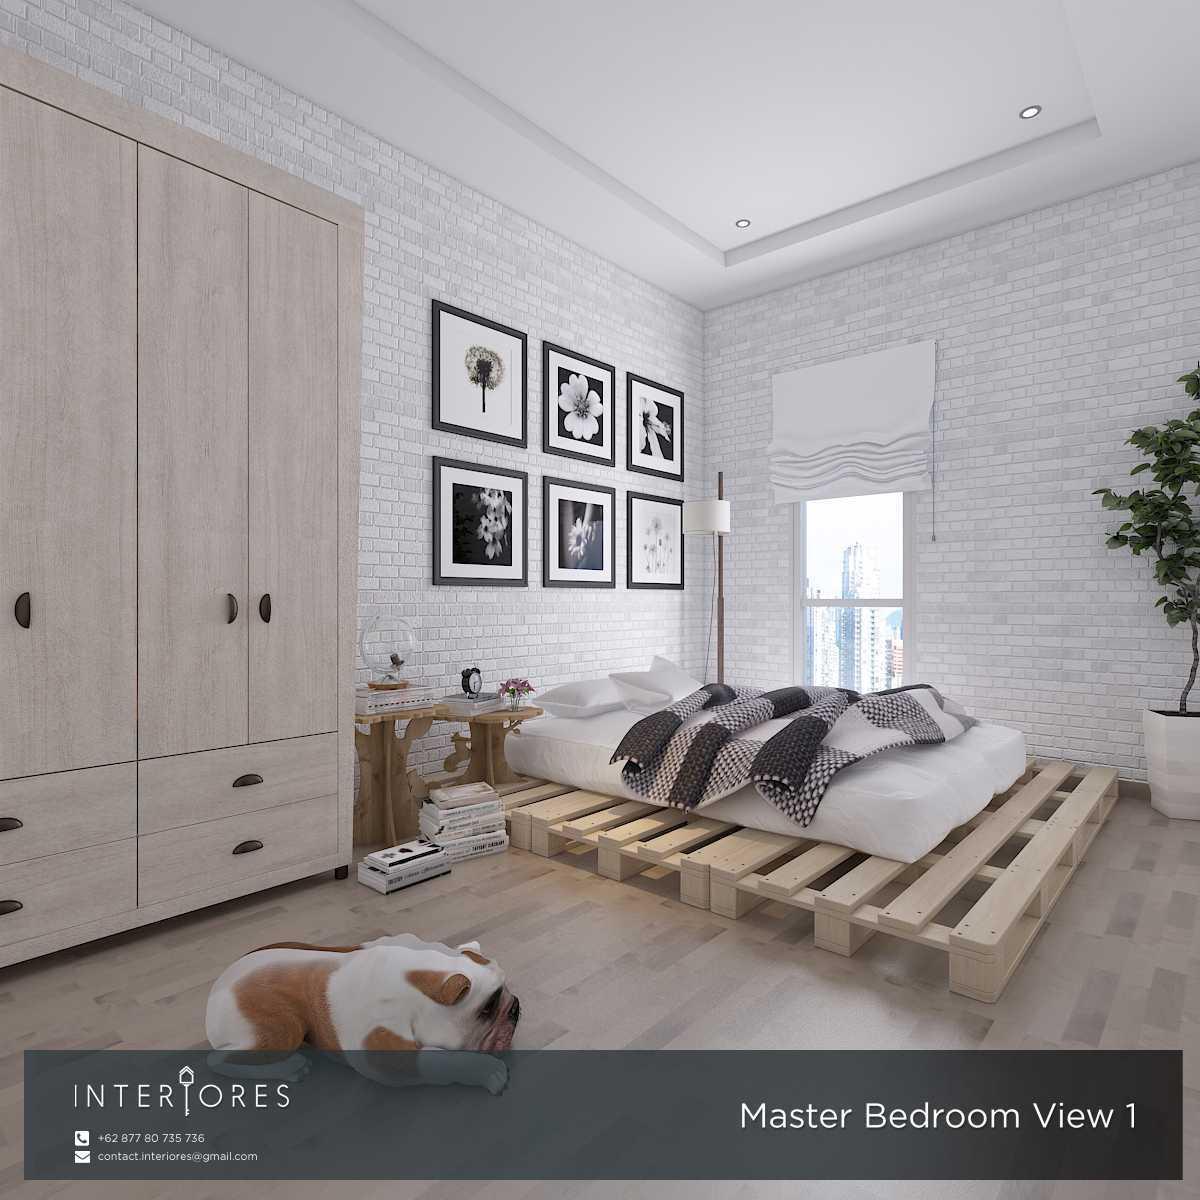 Interiores Interior Consultant & Build P. Scandi Pejaten Pejaten Master Bedroom Modern,skandinavia 17958